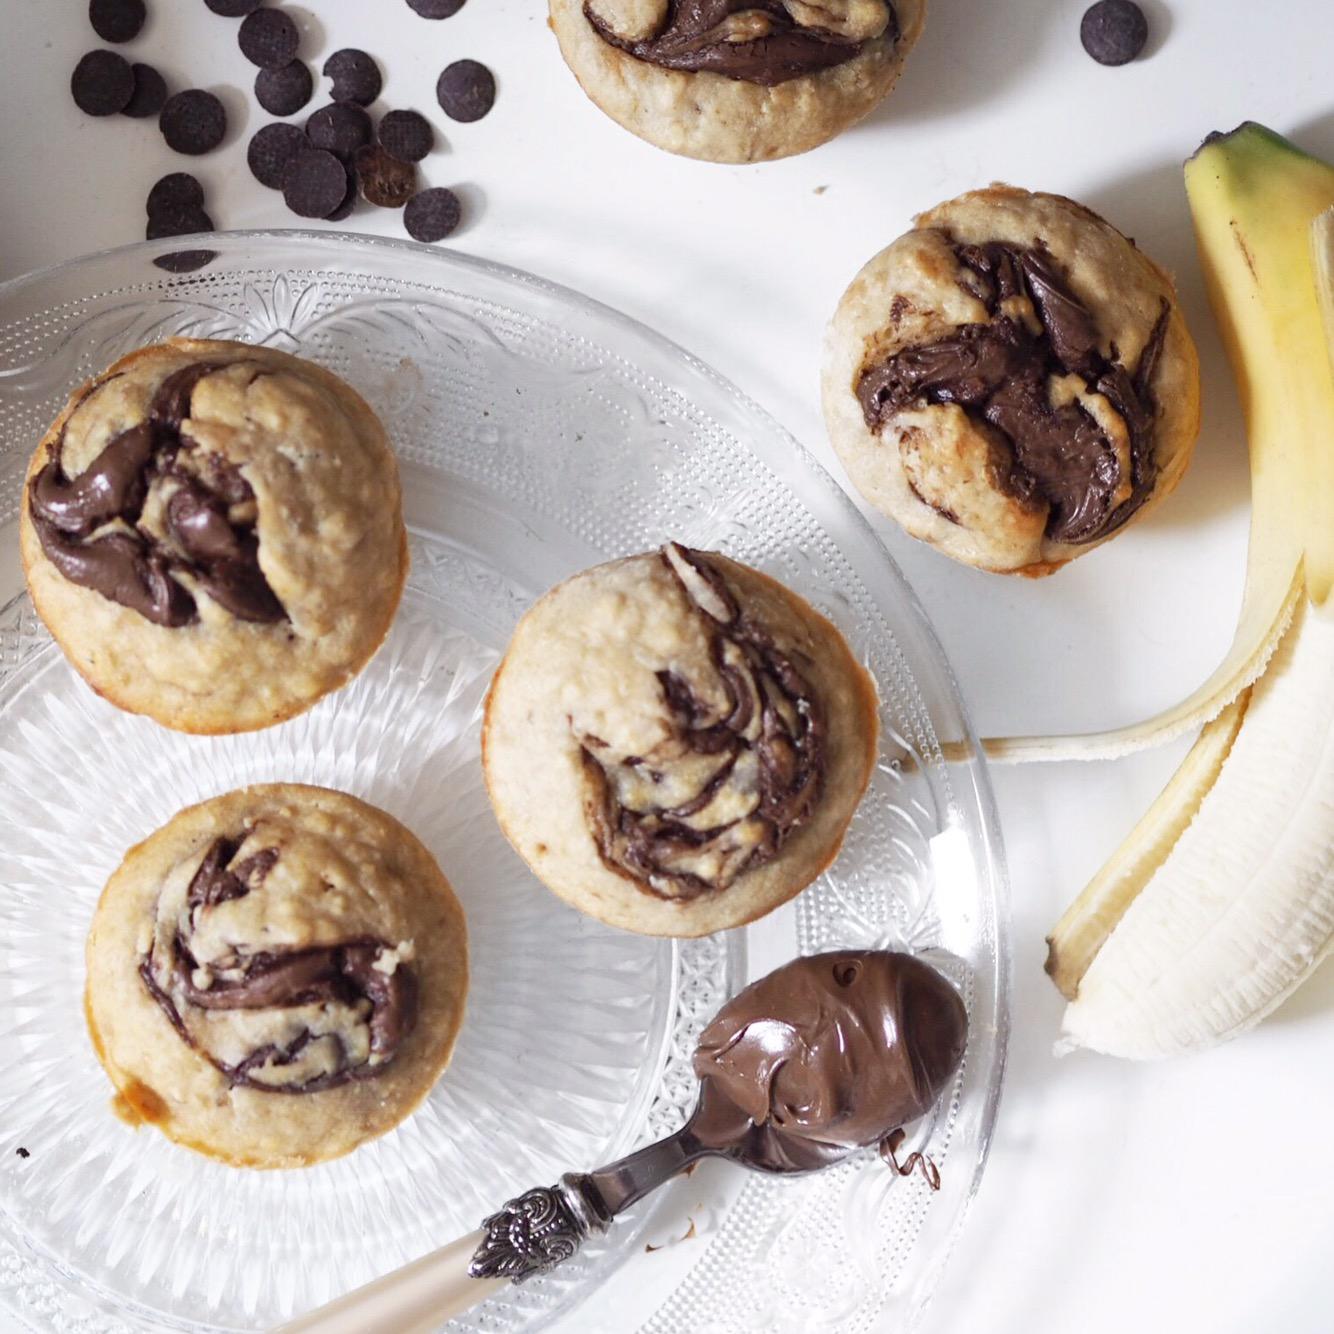 Vegane Bananenbrot Muffins mit Schokoswirl